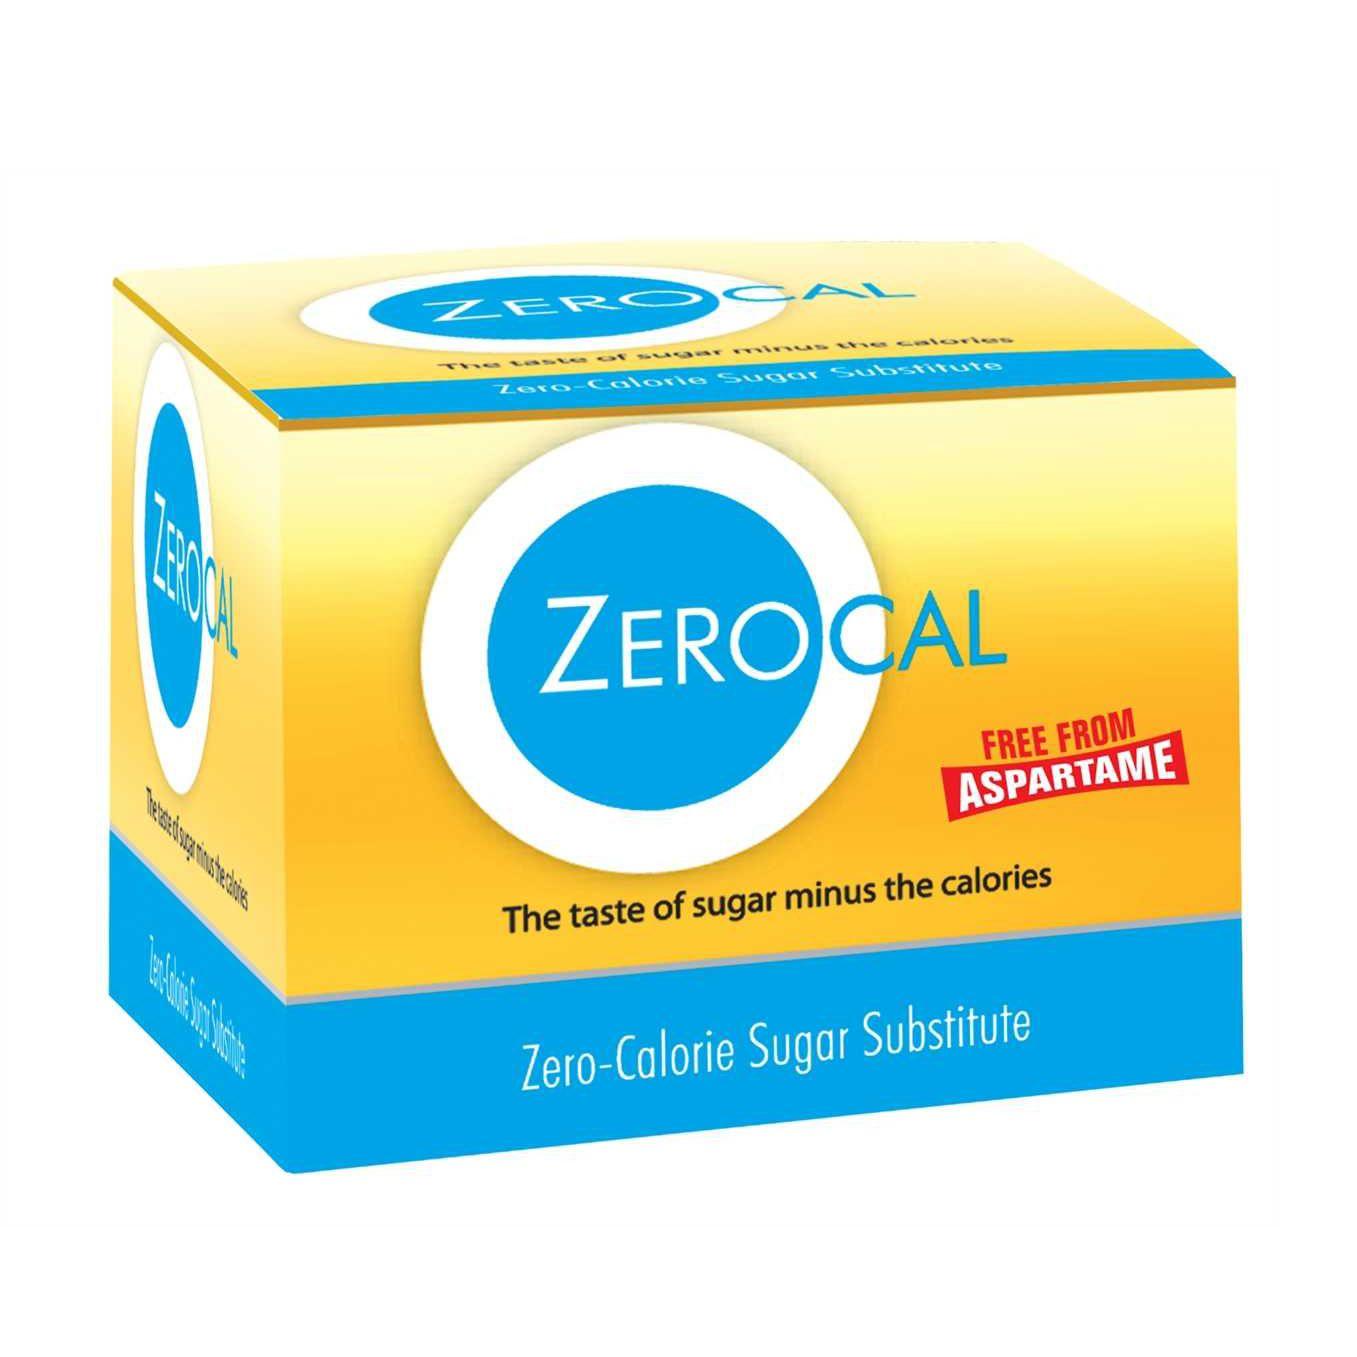 Zerocal Sachet Sugar Free Substitute Sweetener 25 pcs / 75 pcs / 150 pcs